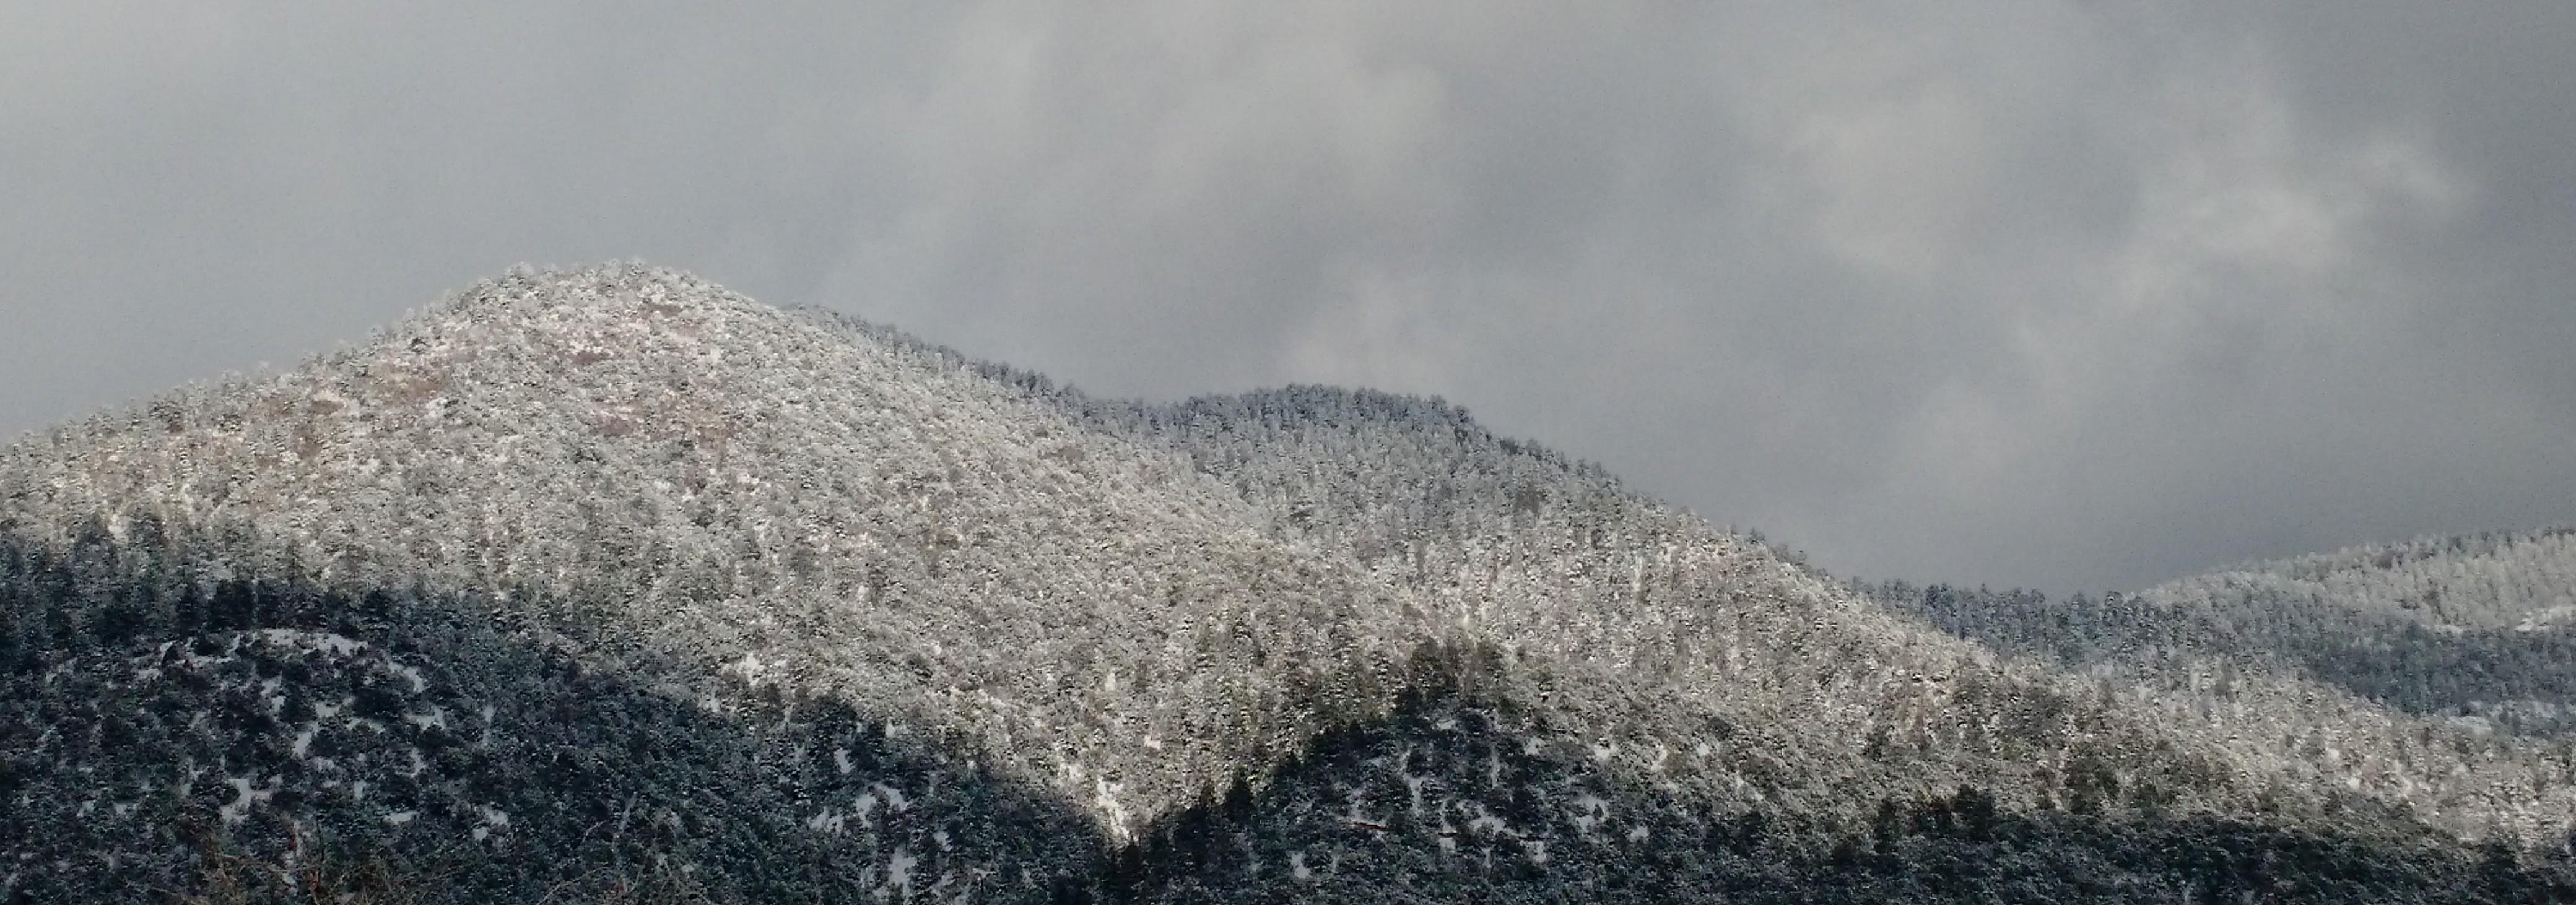 skies & snow hills reversal Feb 2016